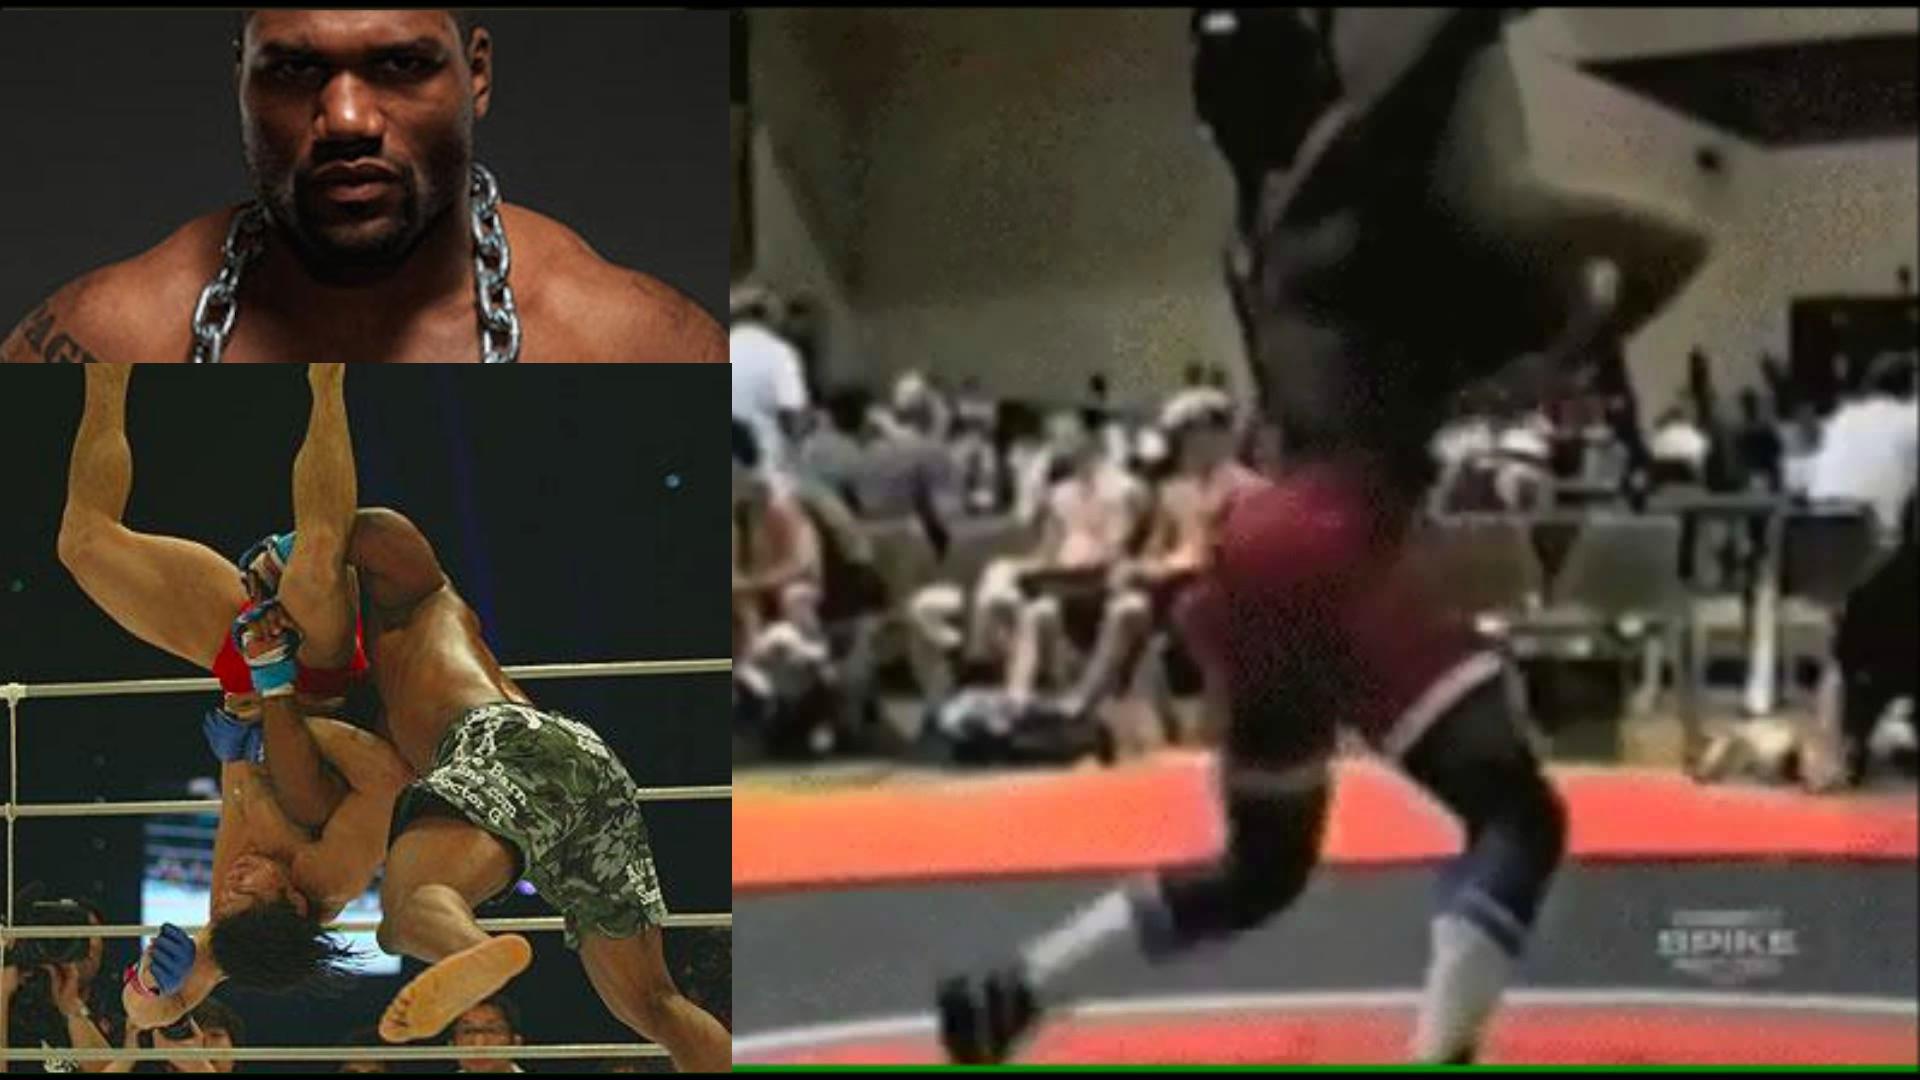 Watch: Rampage Jackson Powerbombing in High School Wrestling